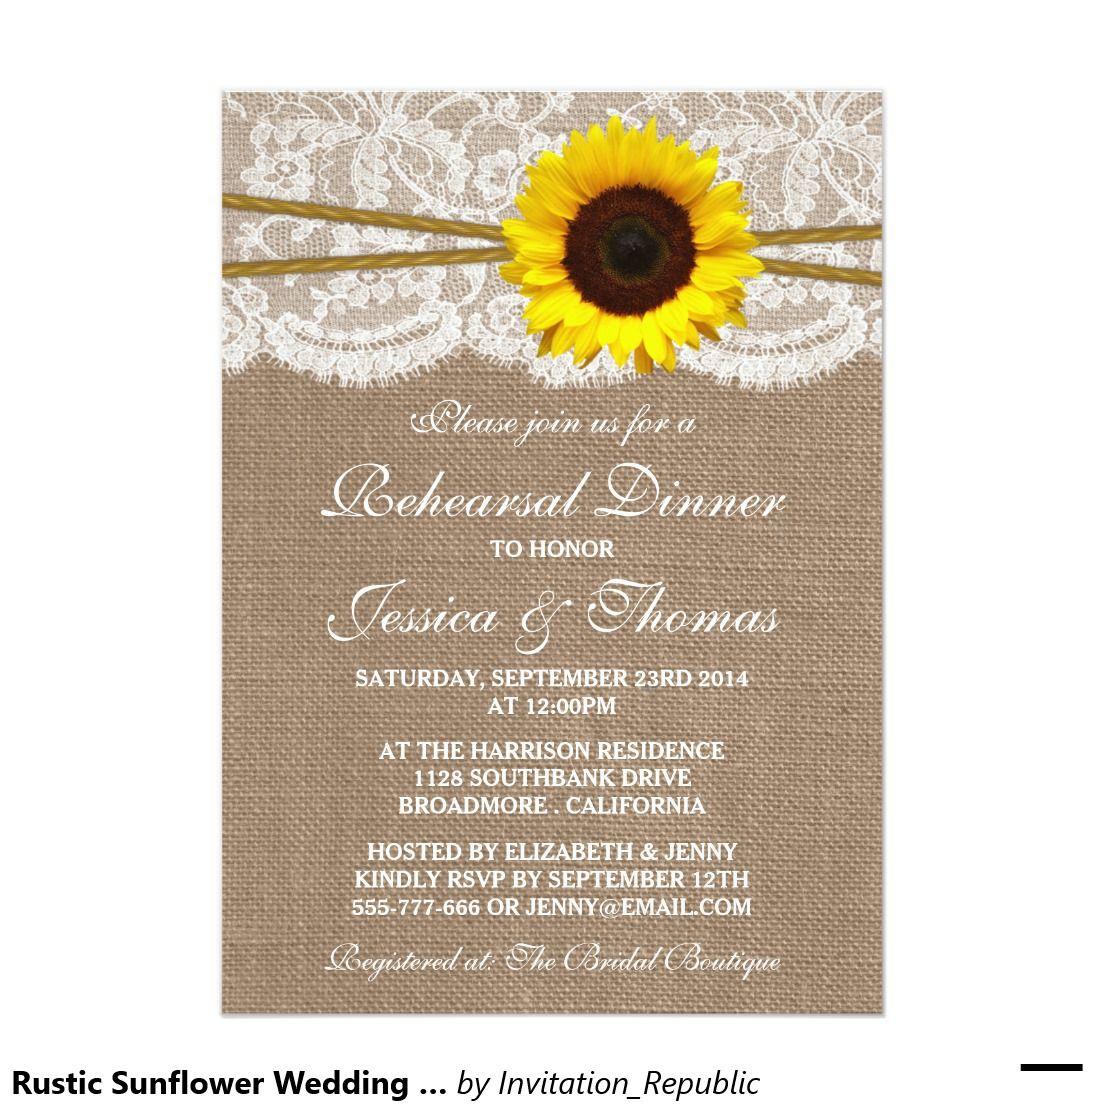 Rustic Sunflower Wedding Rehearsal Dinner Invitation